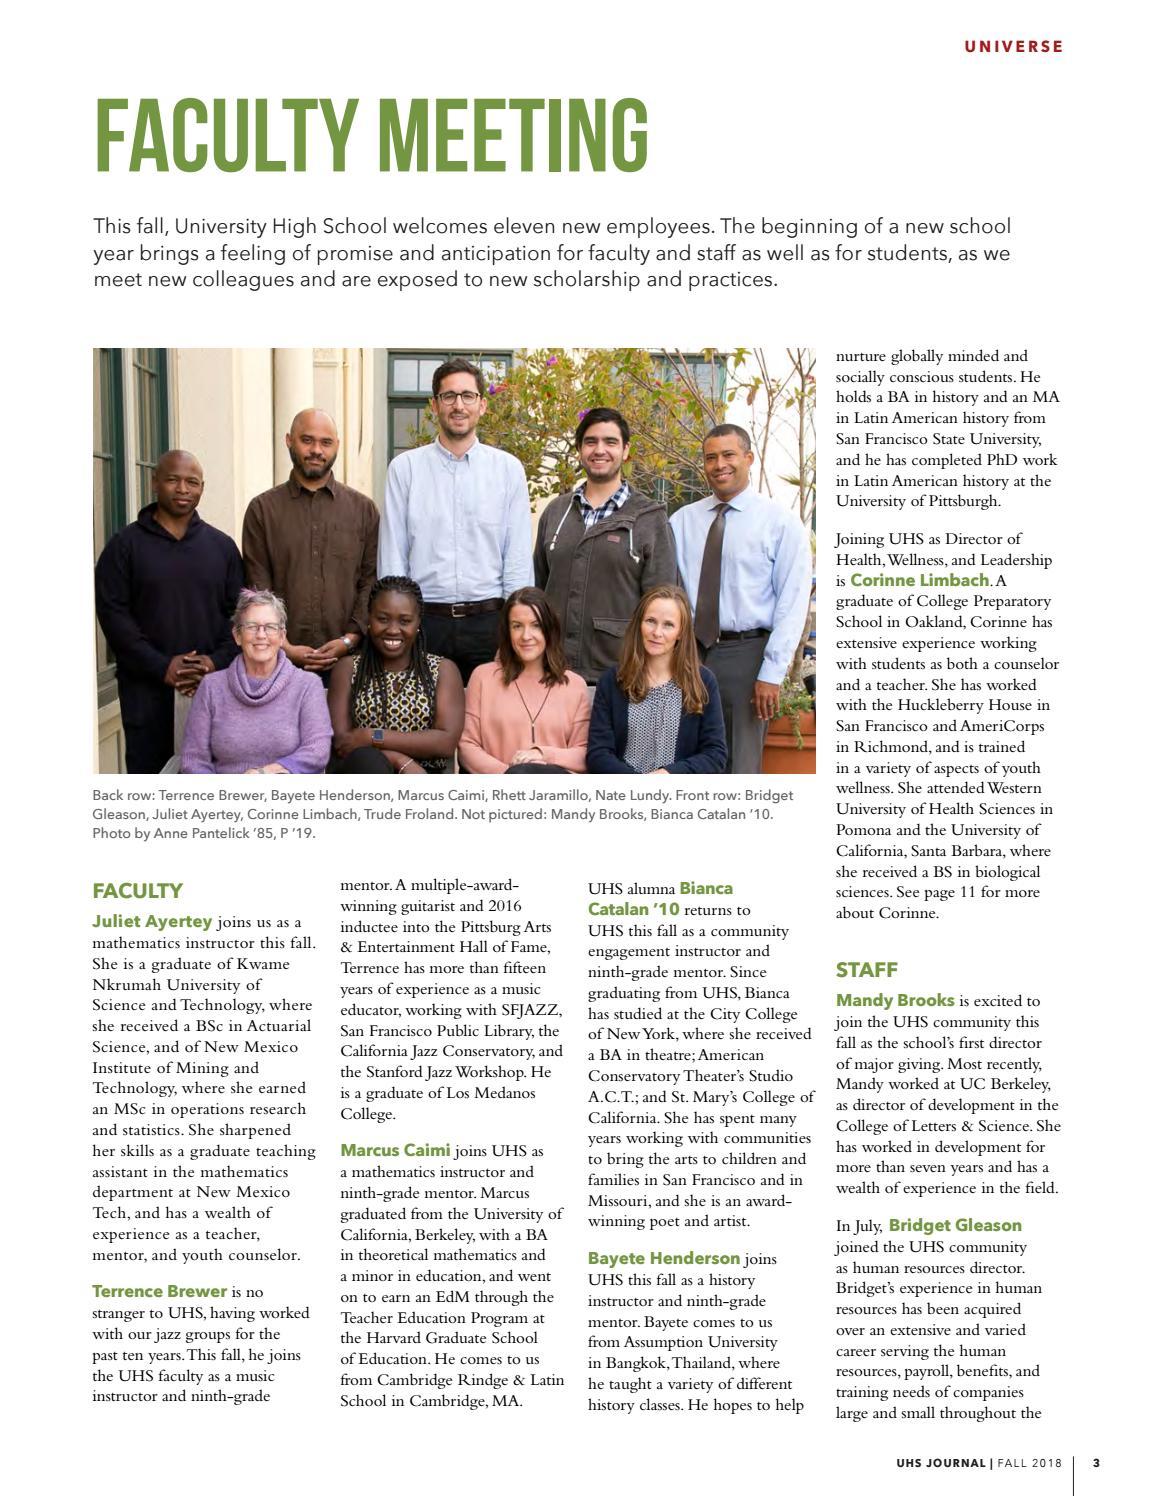 UHS Journal - Fall 2018 by SFUHSorg - issuu